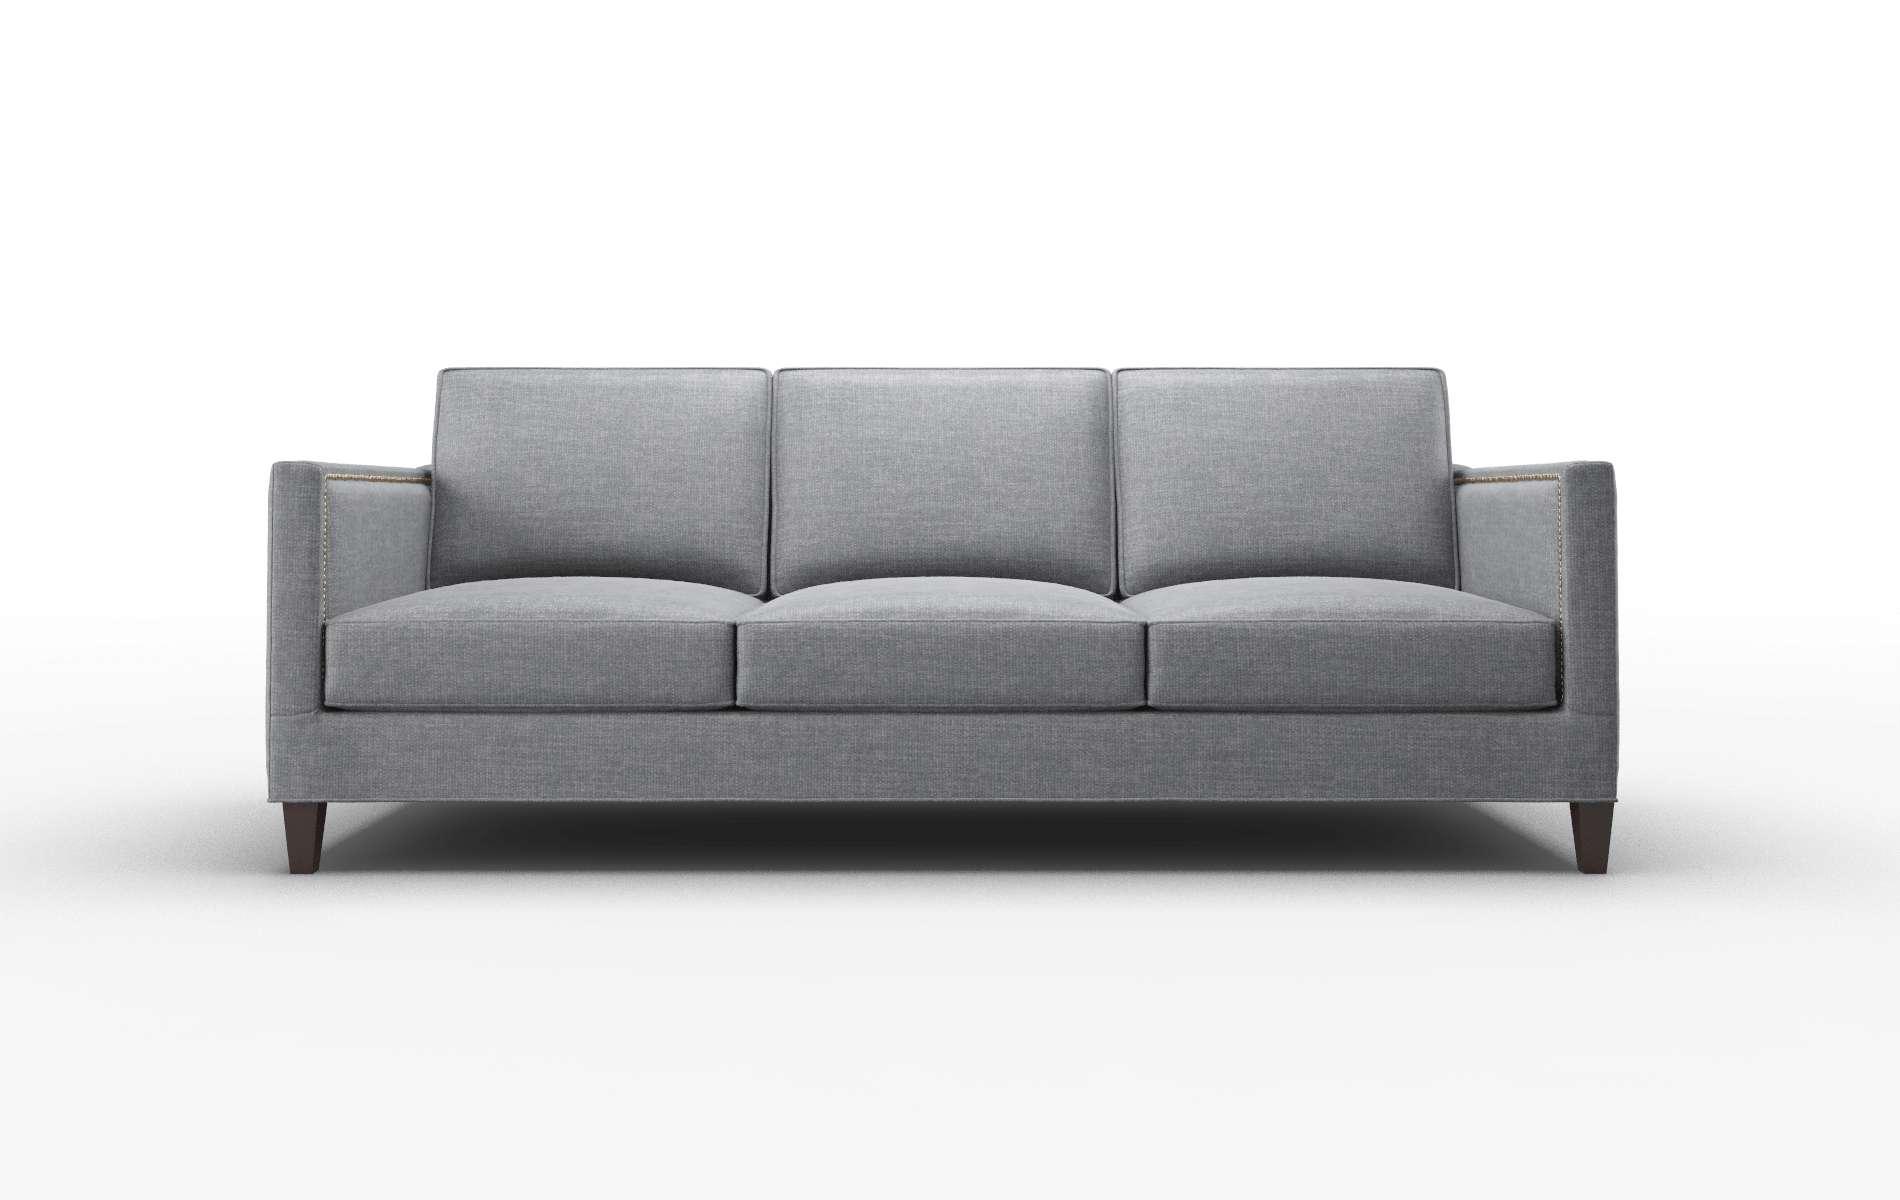 Alps Keylargo Graphite Sofa espresso legs 1